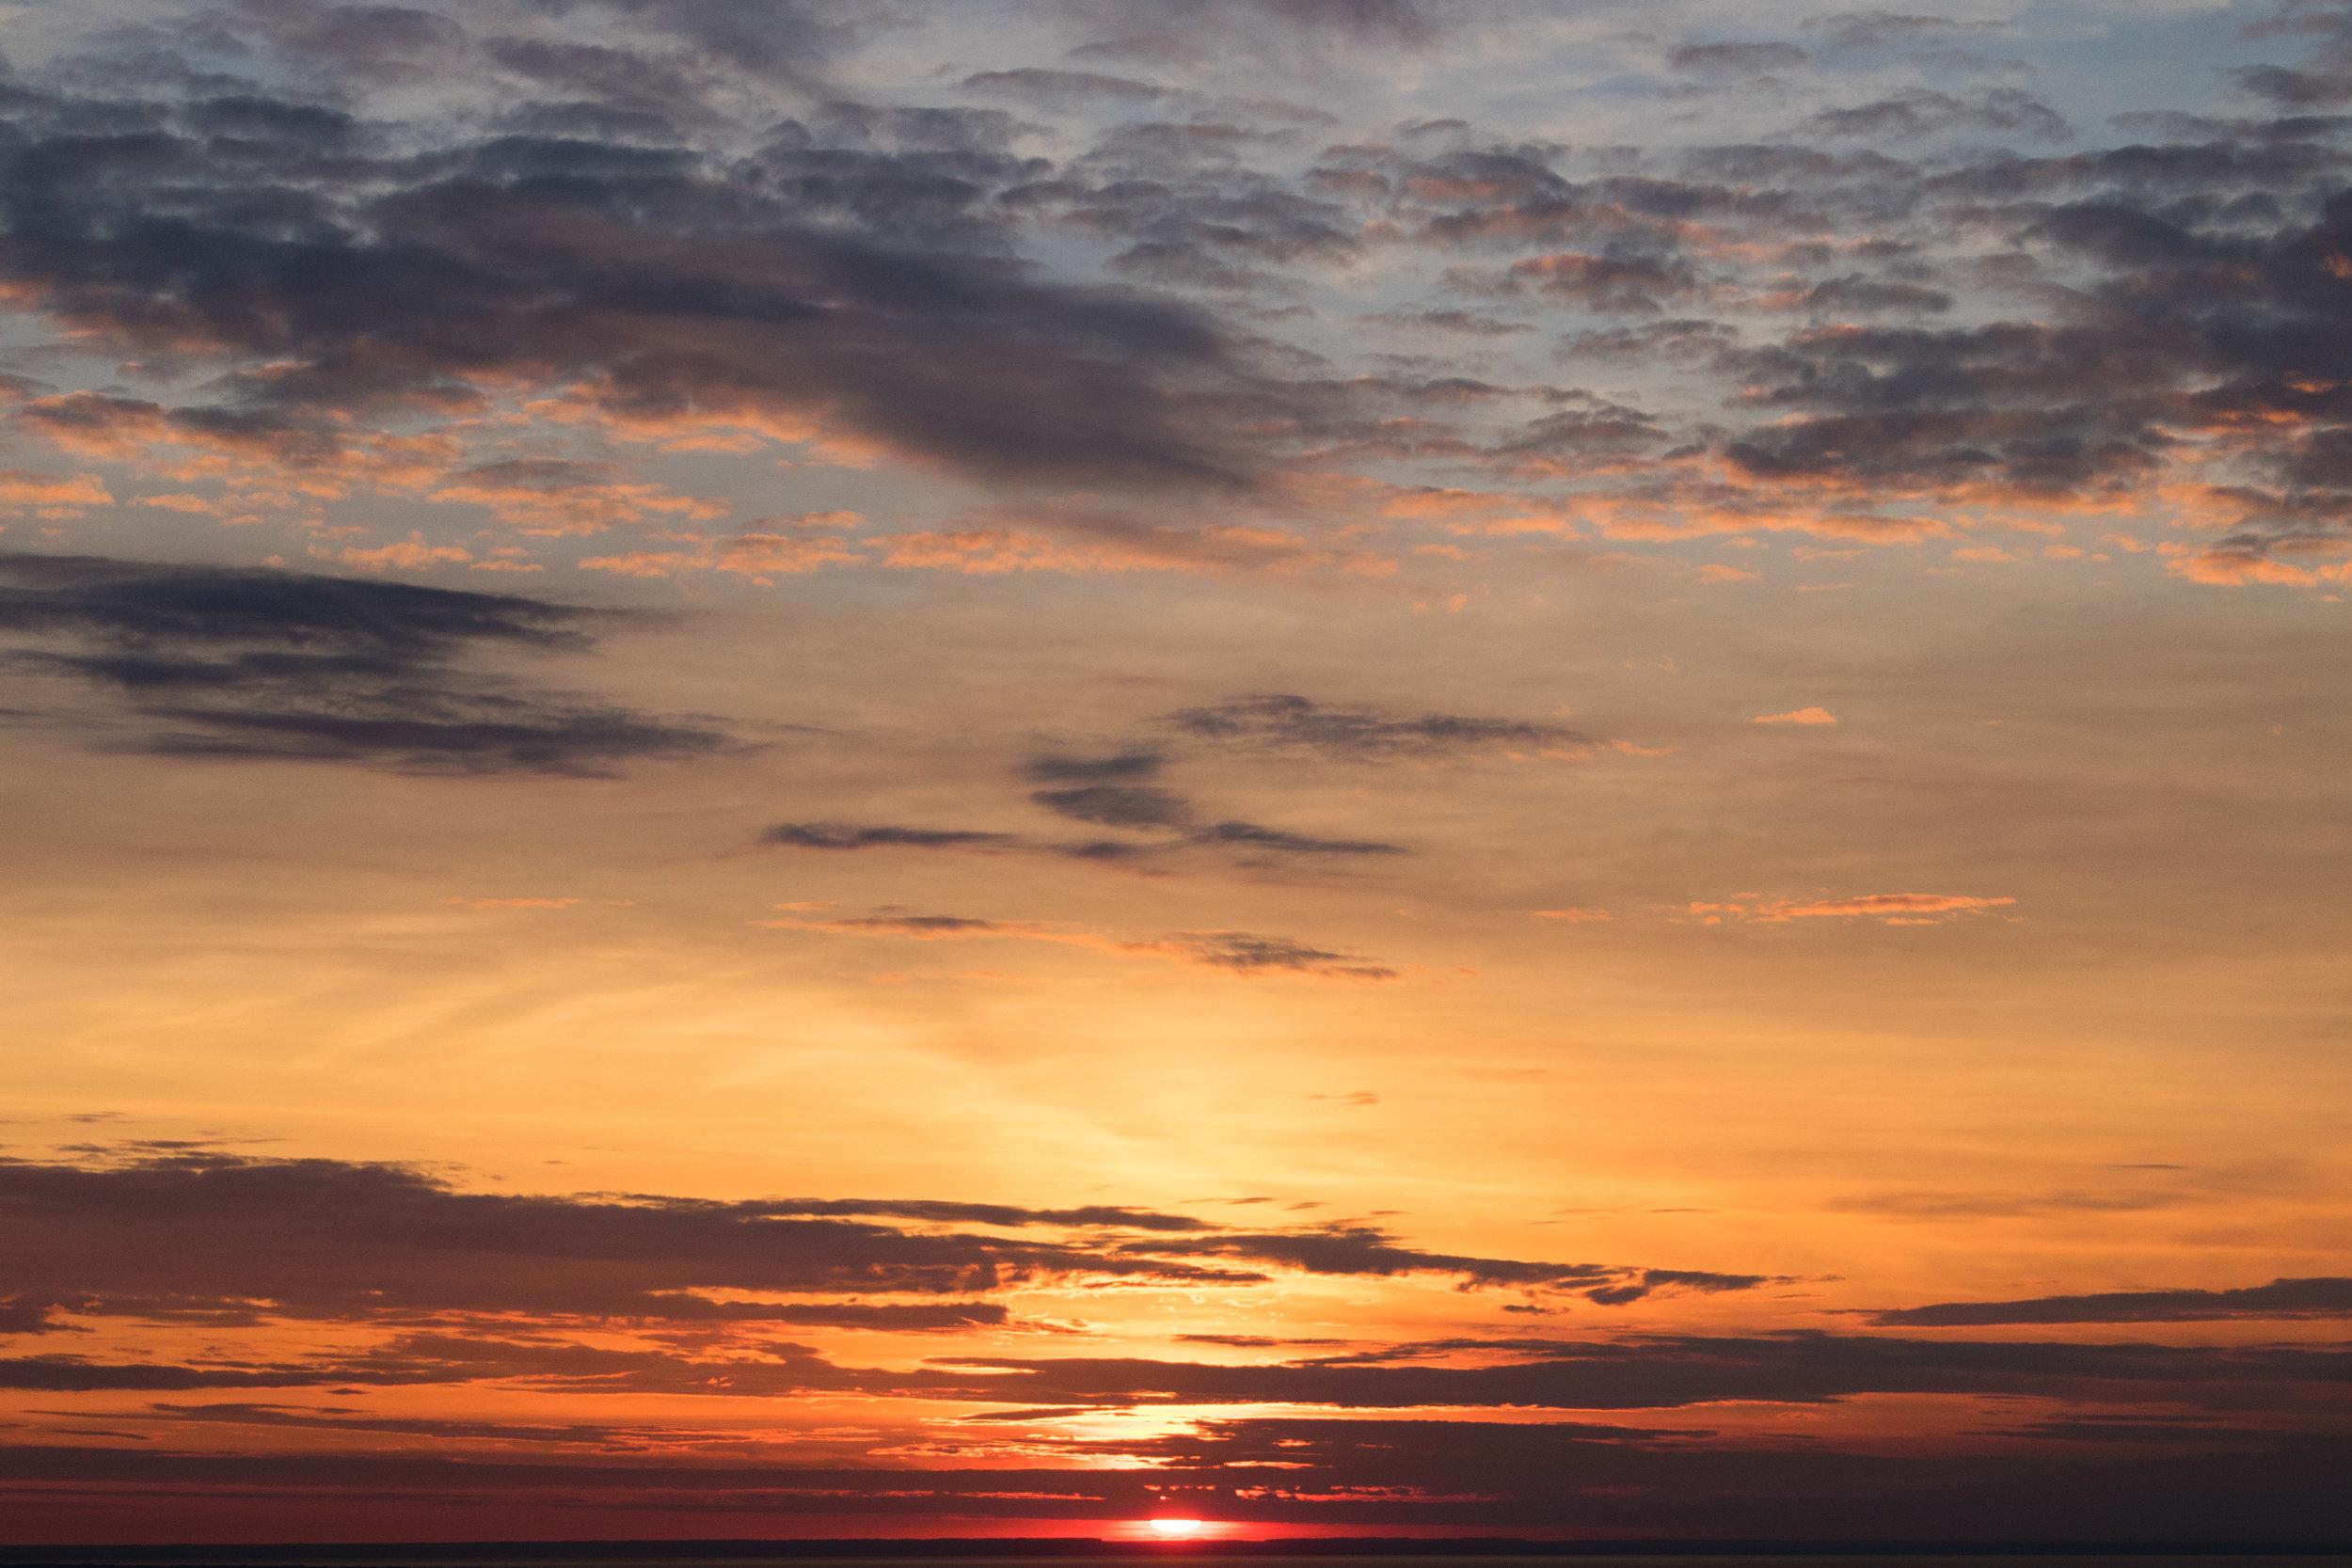 Sunset-Over-Lake-Ontario-Niagara-Falls-Canada-Photography